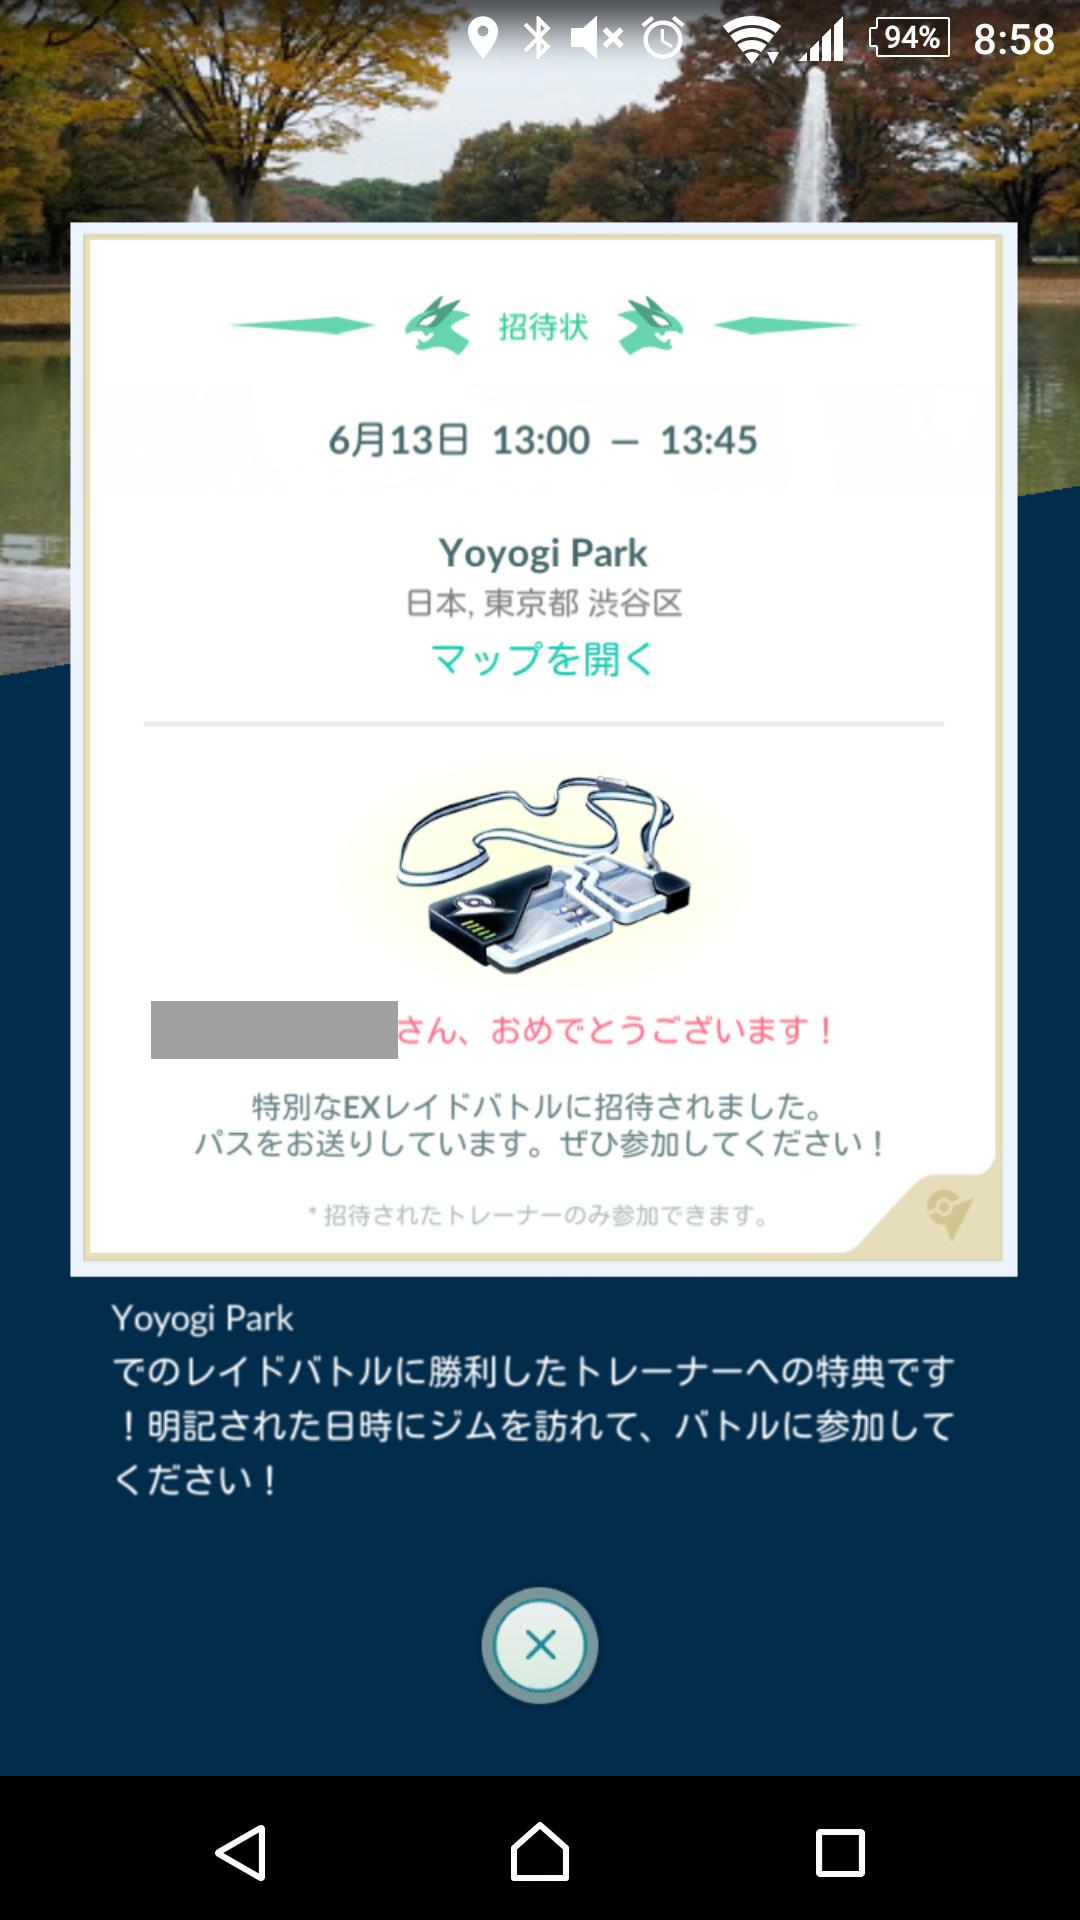 Screenshot_2018-6-06-08-58-39.png